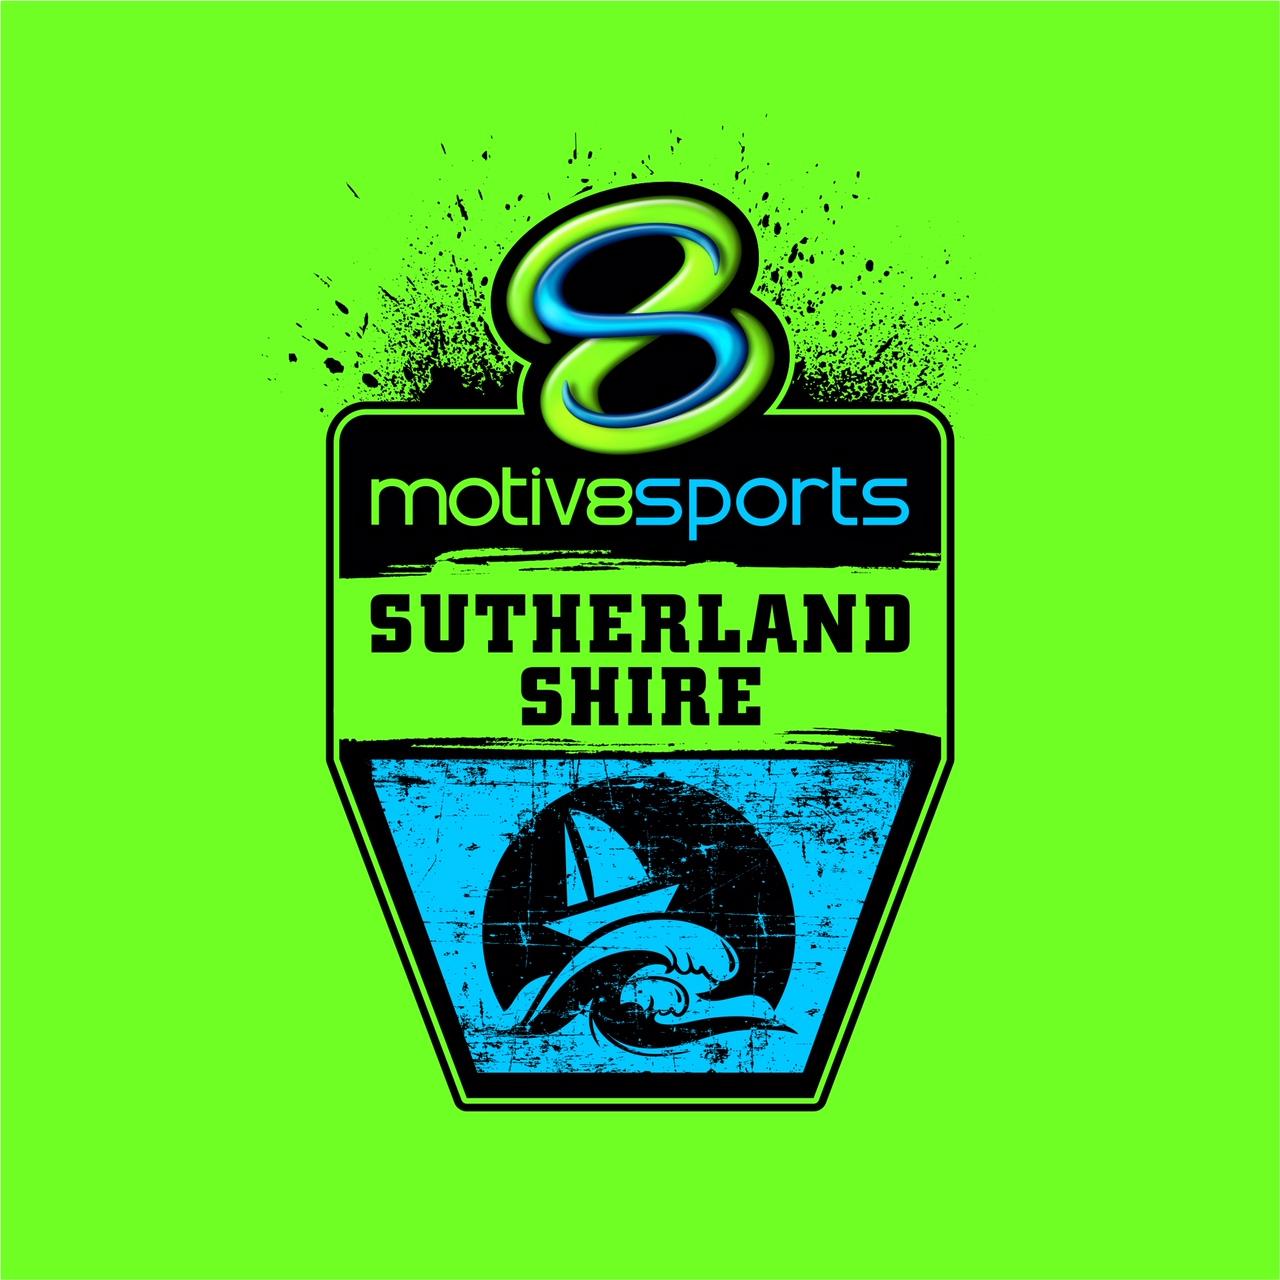 Motiv8sports Sutherland Shire